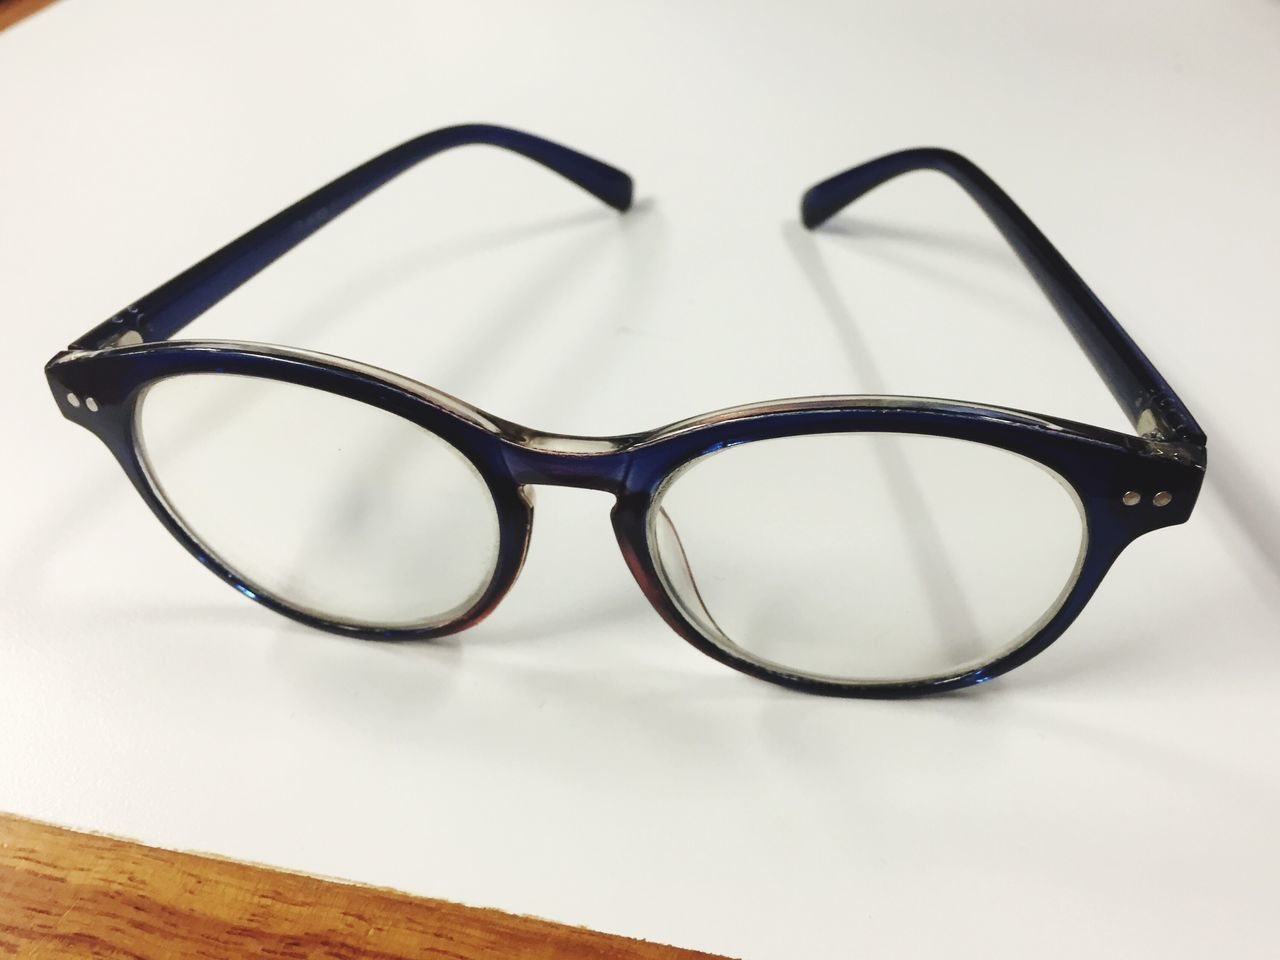 eyeglasses, vision, still life, eyewear, white background, eyesight, sunglasses, table, no people, close-up, glasses, studio shot, optometrist, indoors, eye test equipment, reading glasses, day